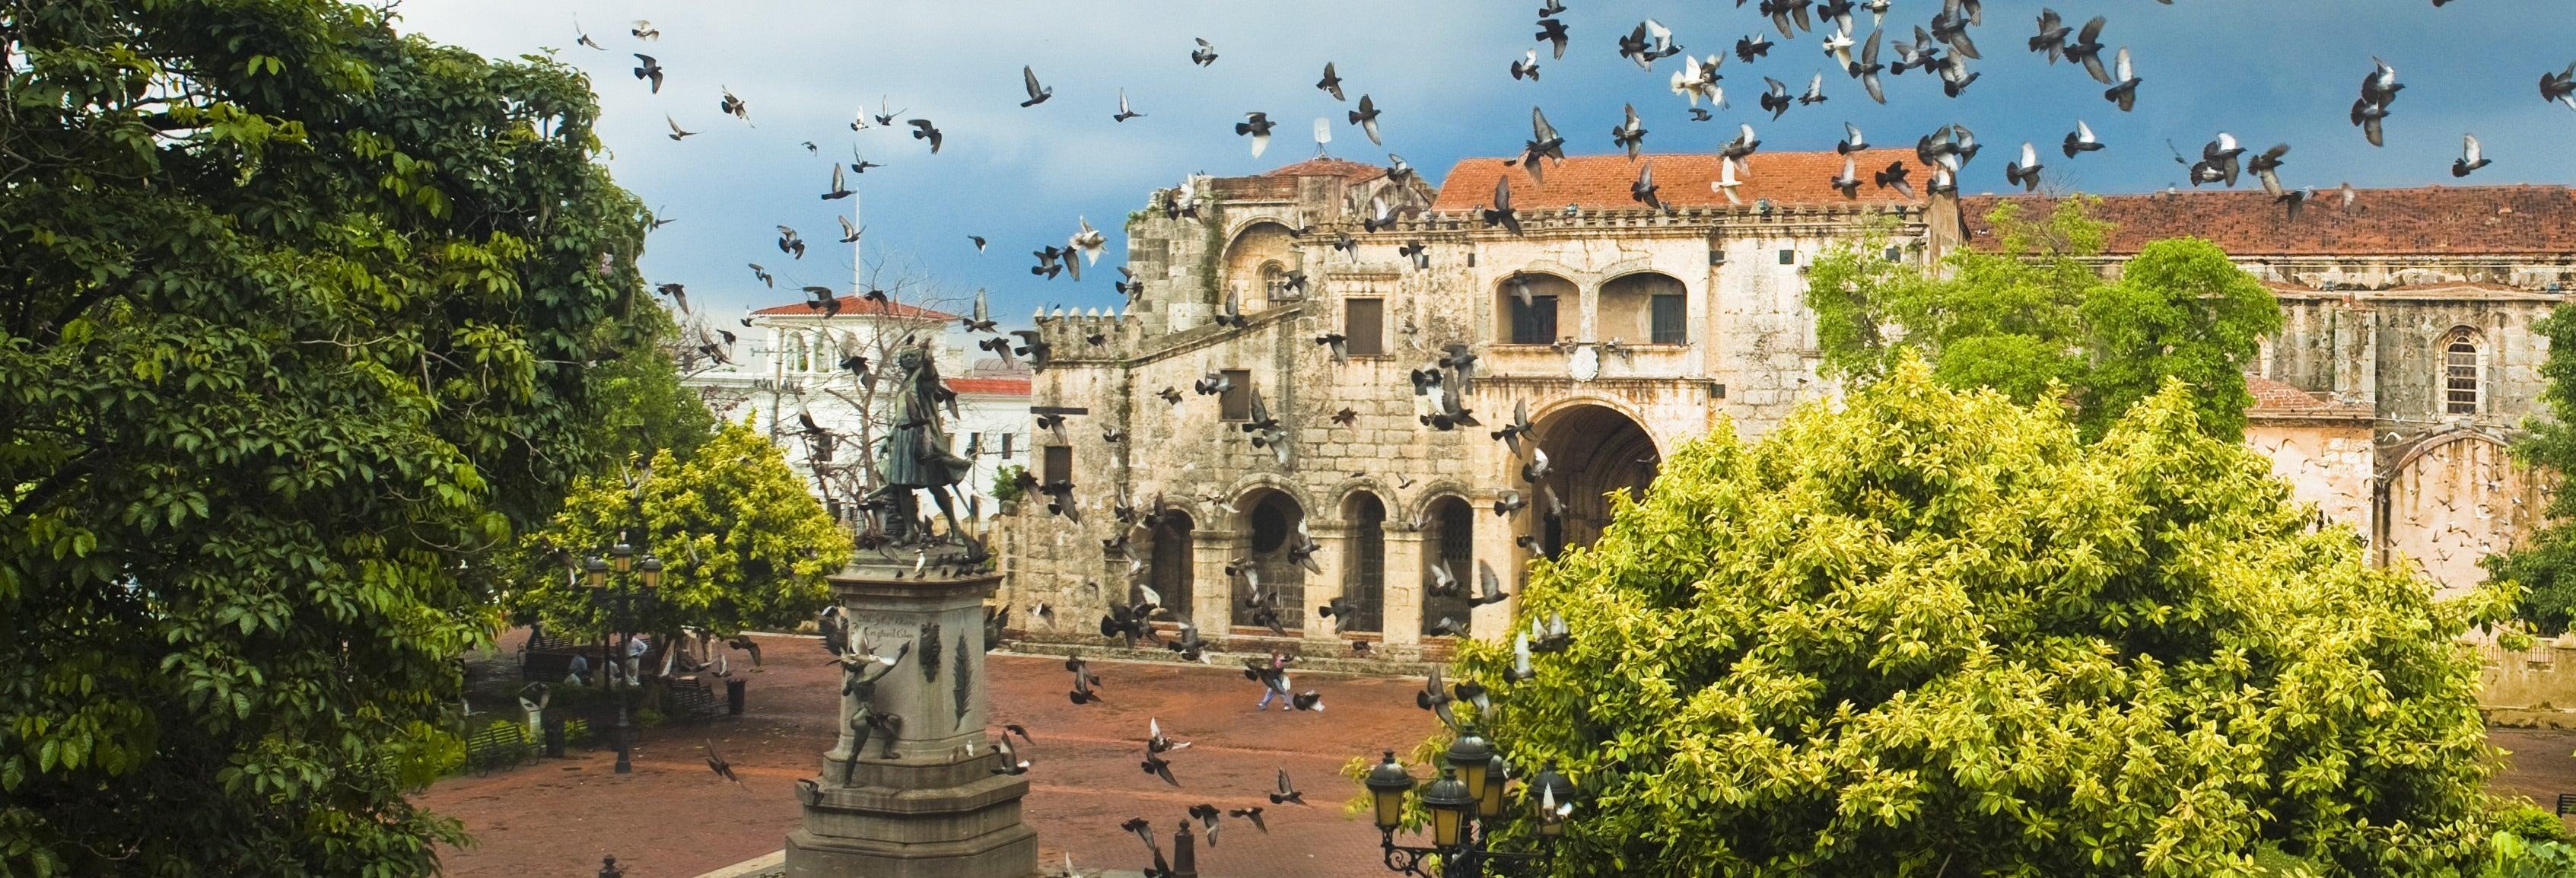 Tour panorámico por Santo Domingo